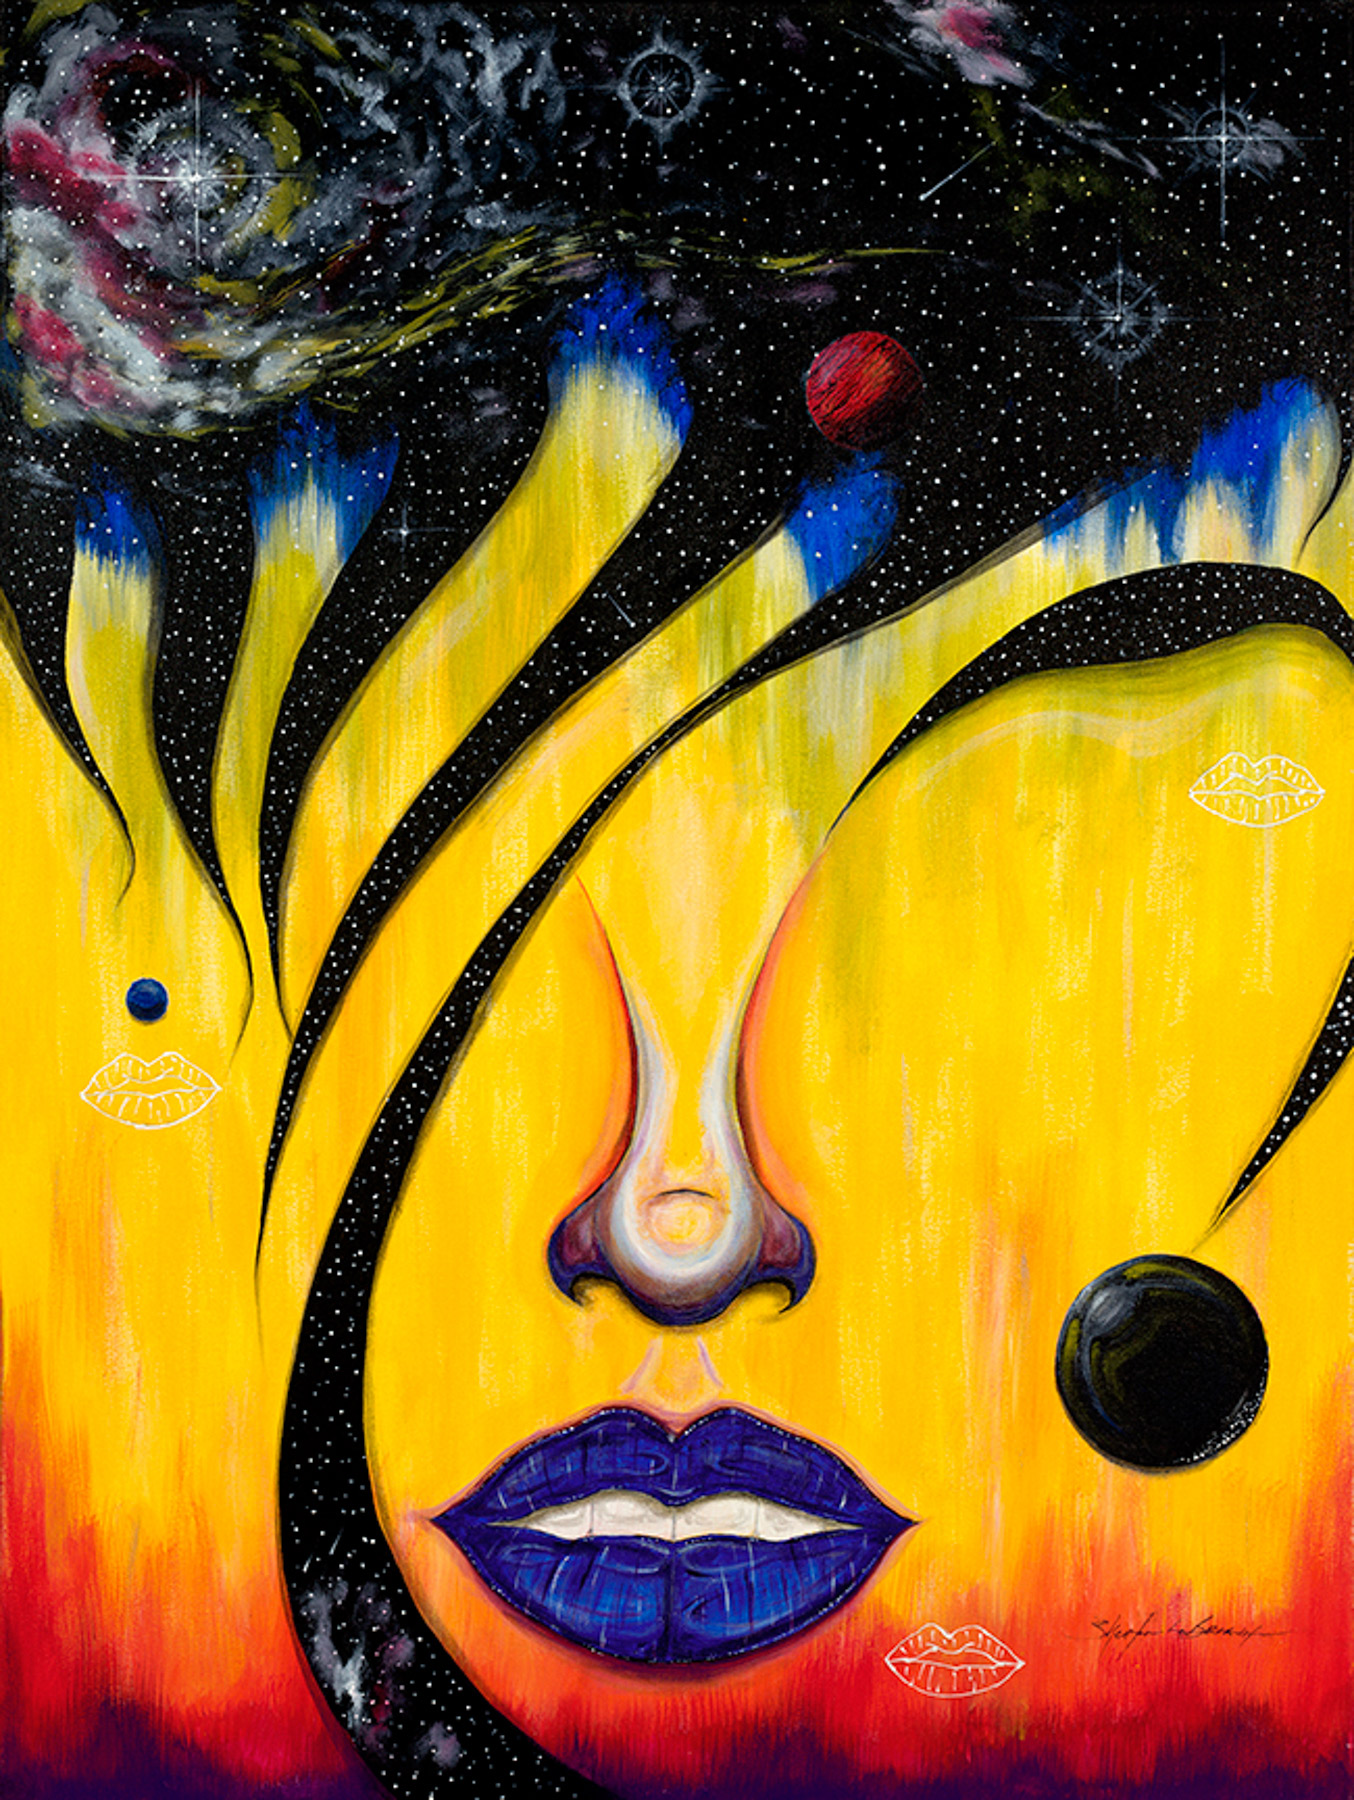 Tremble,-Starla-Abstraction-1.jpg